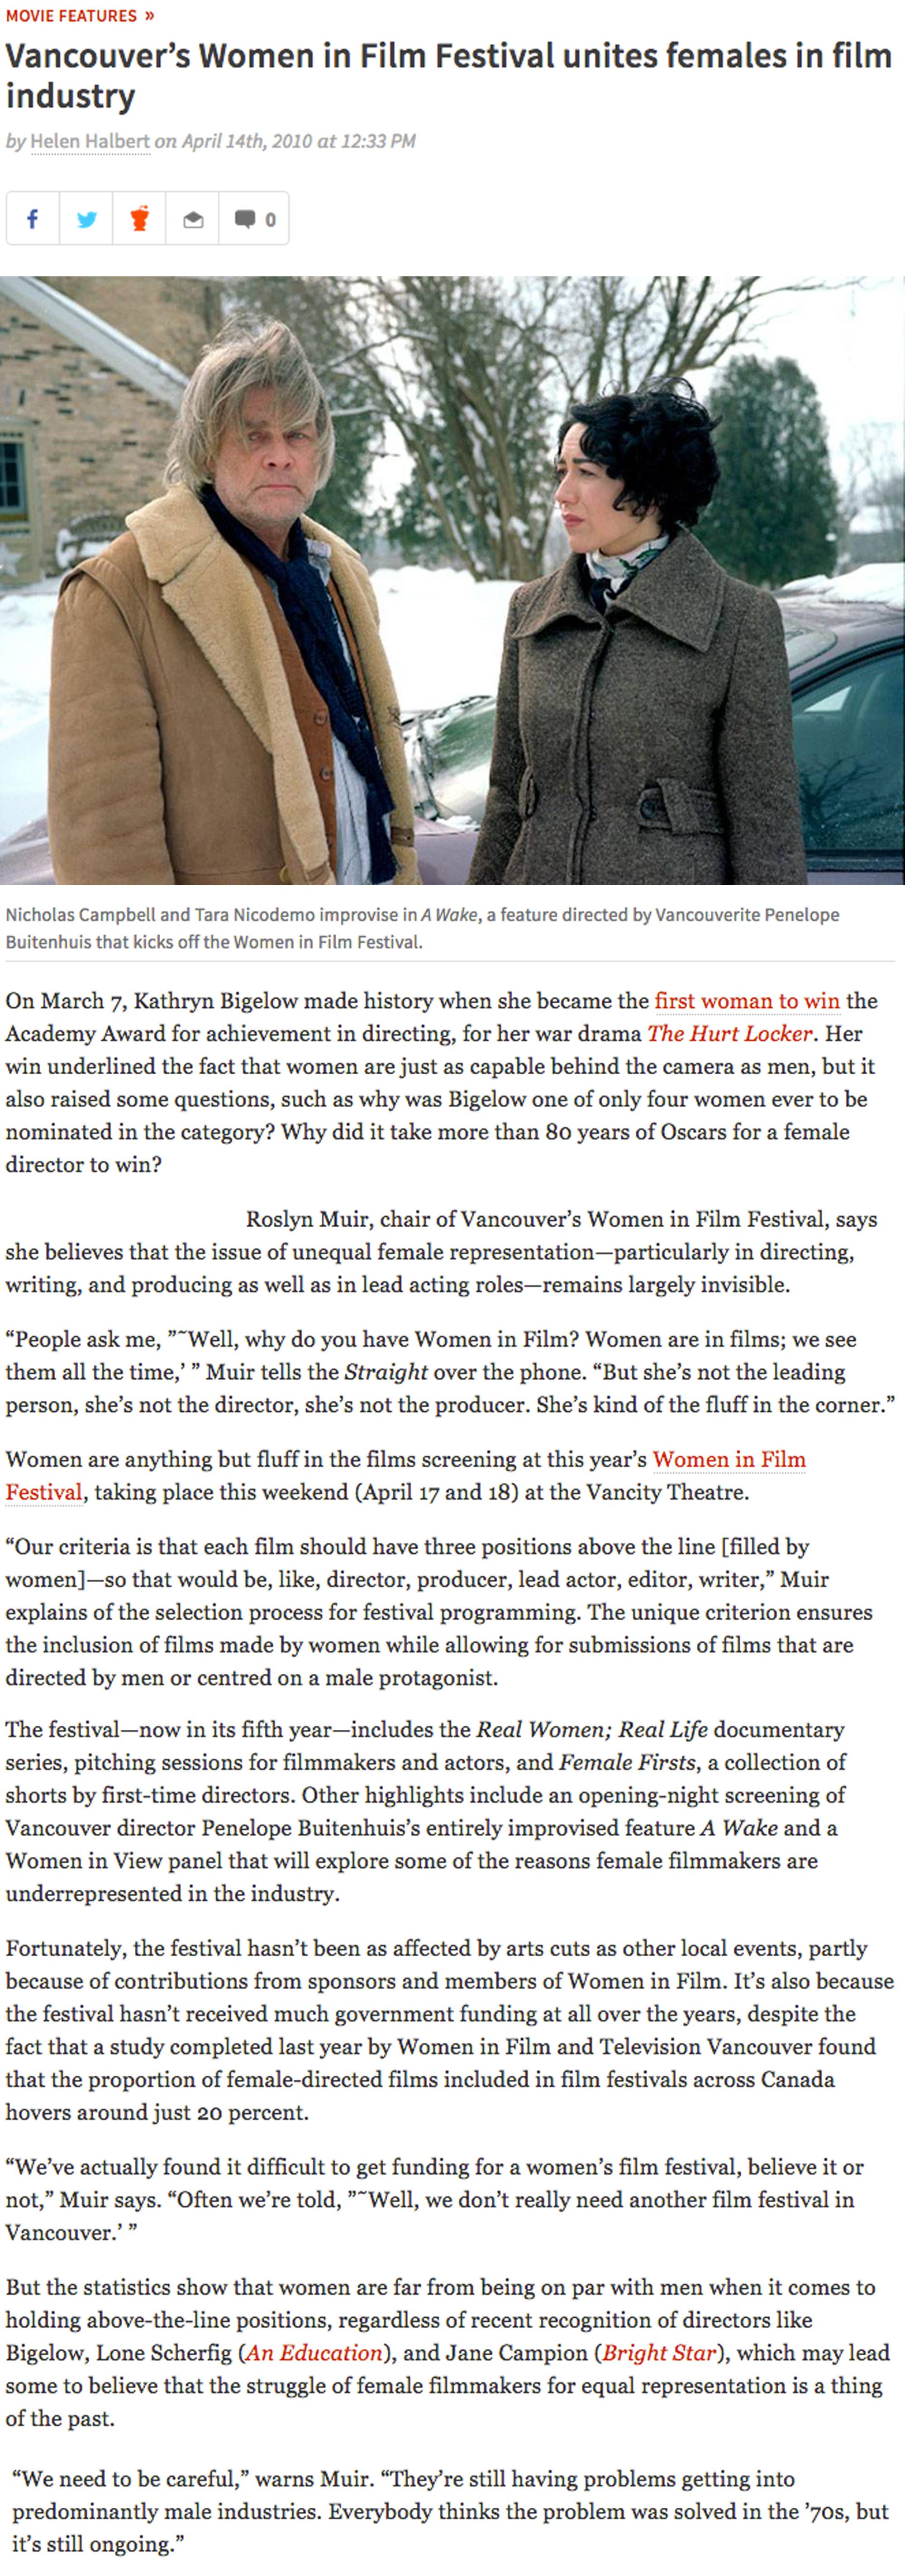 PB_the_straight_women_in_film_article.jpg